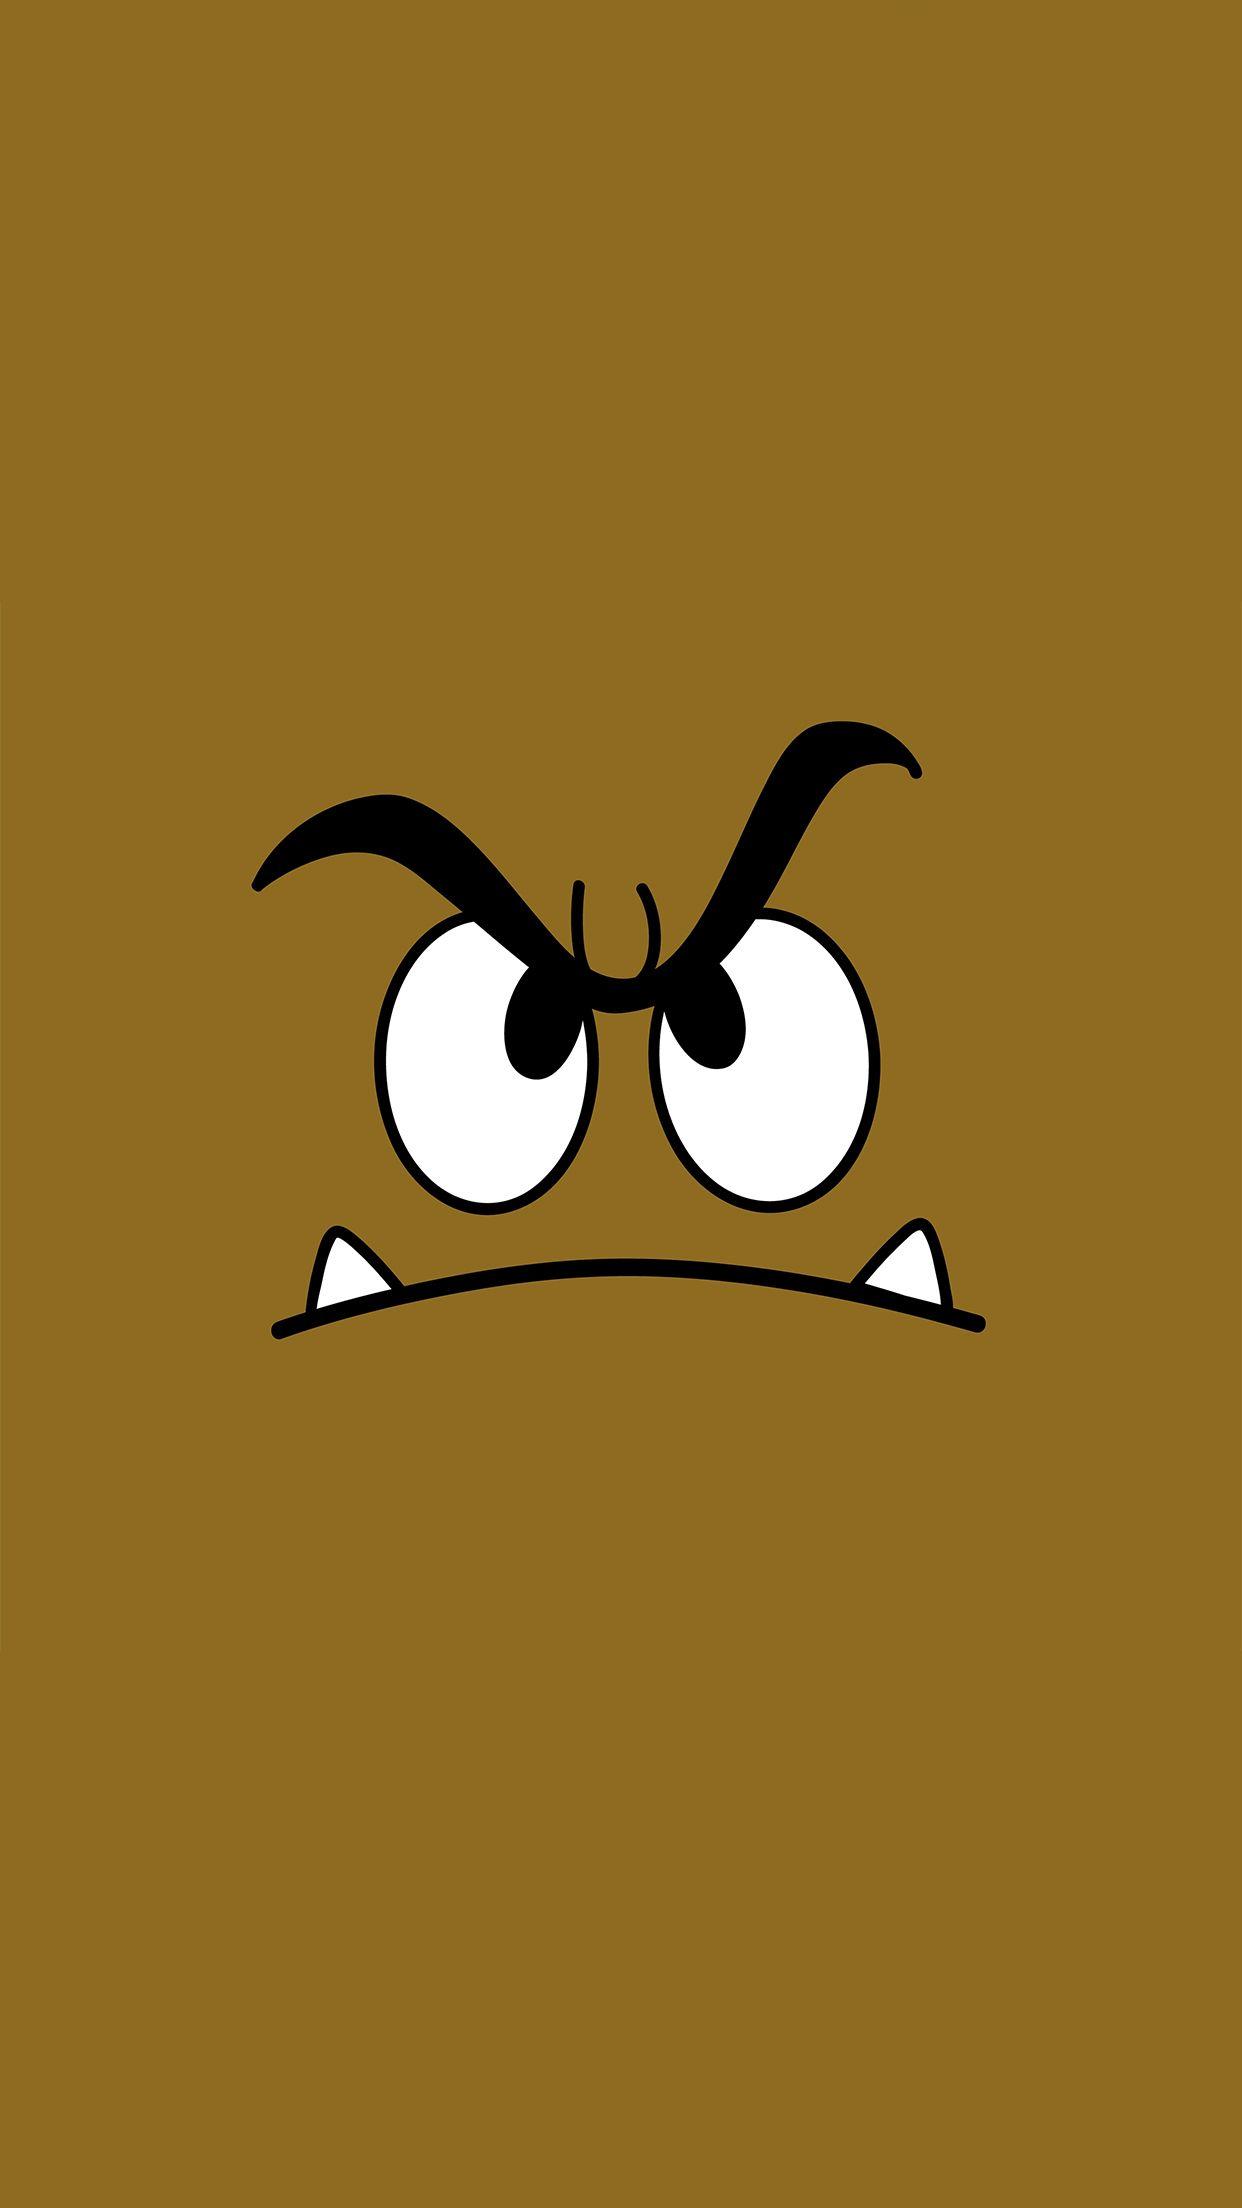 Super-Mario-Goomba-3Wallpapers-iPhone-Parallax | Mario Bros | Pinterest